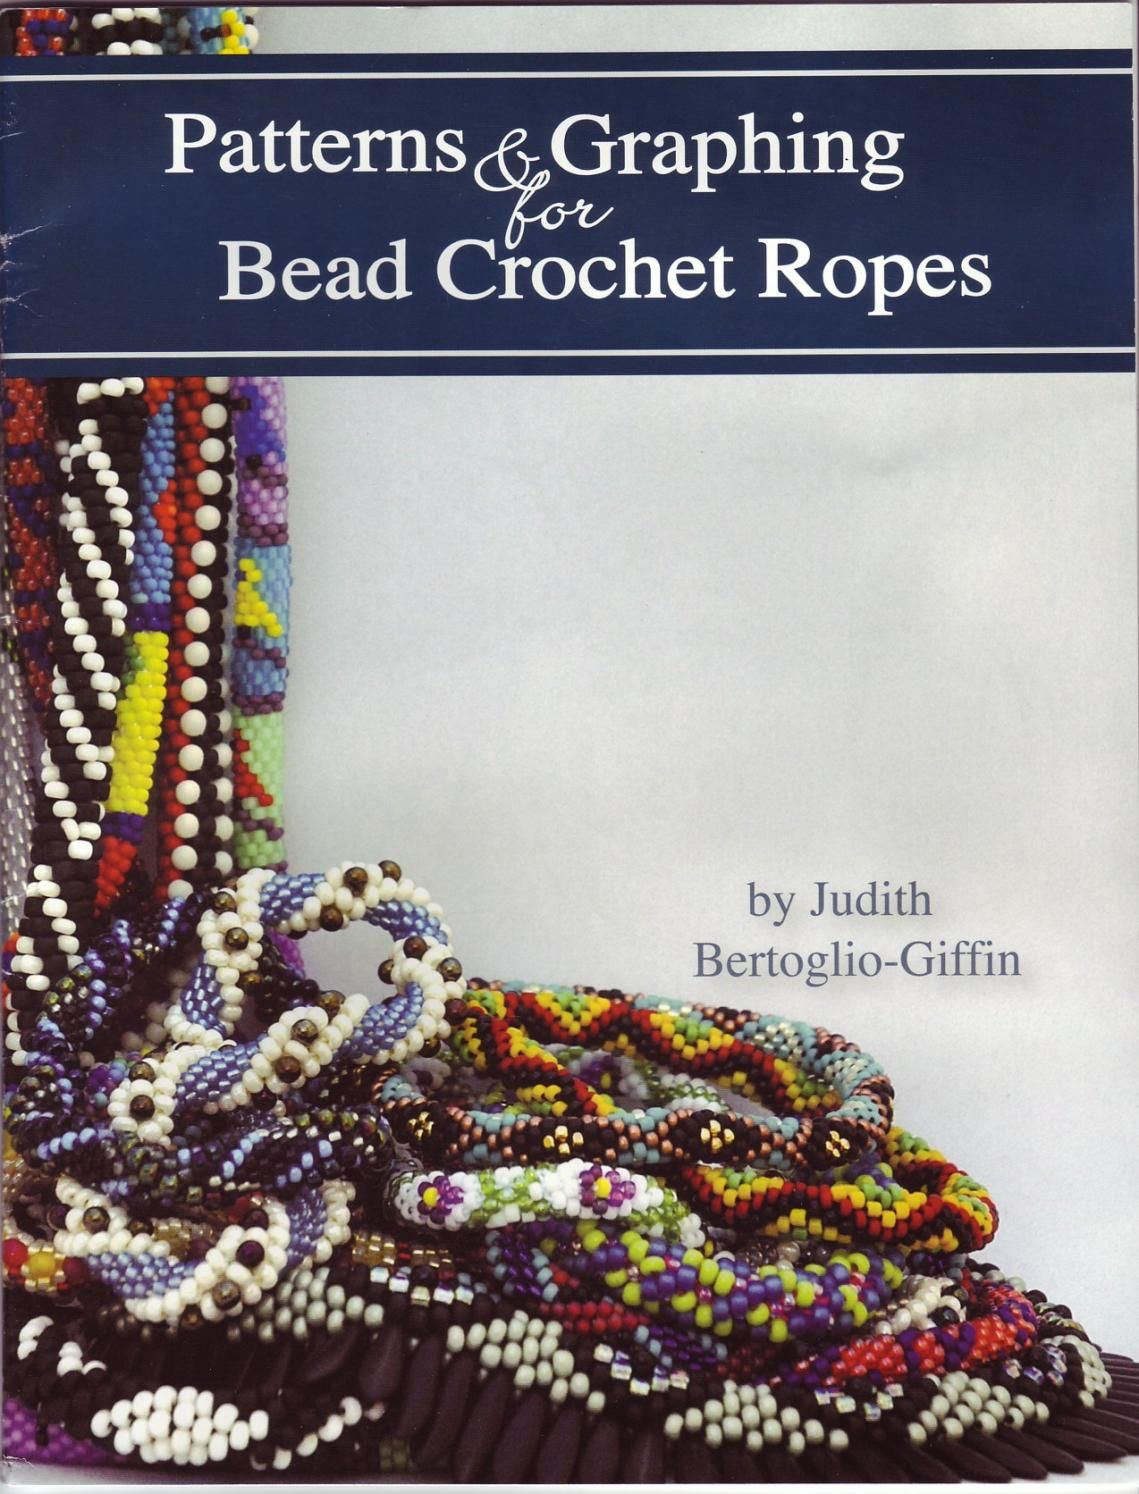 bead crochet patterns free